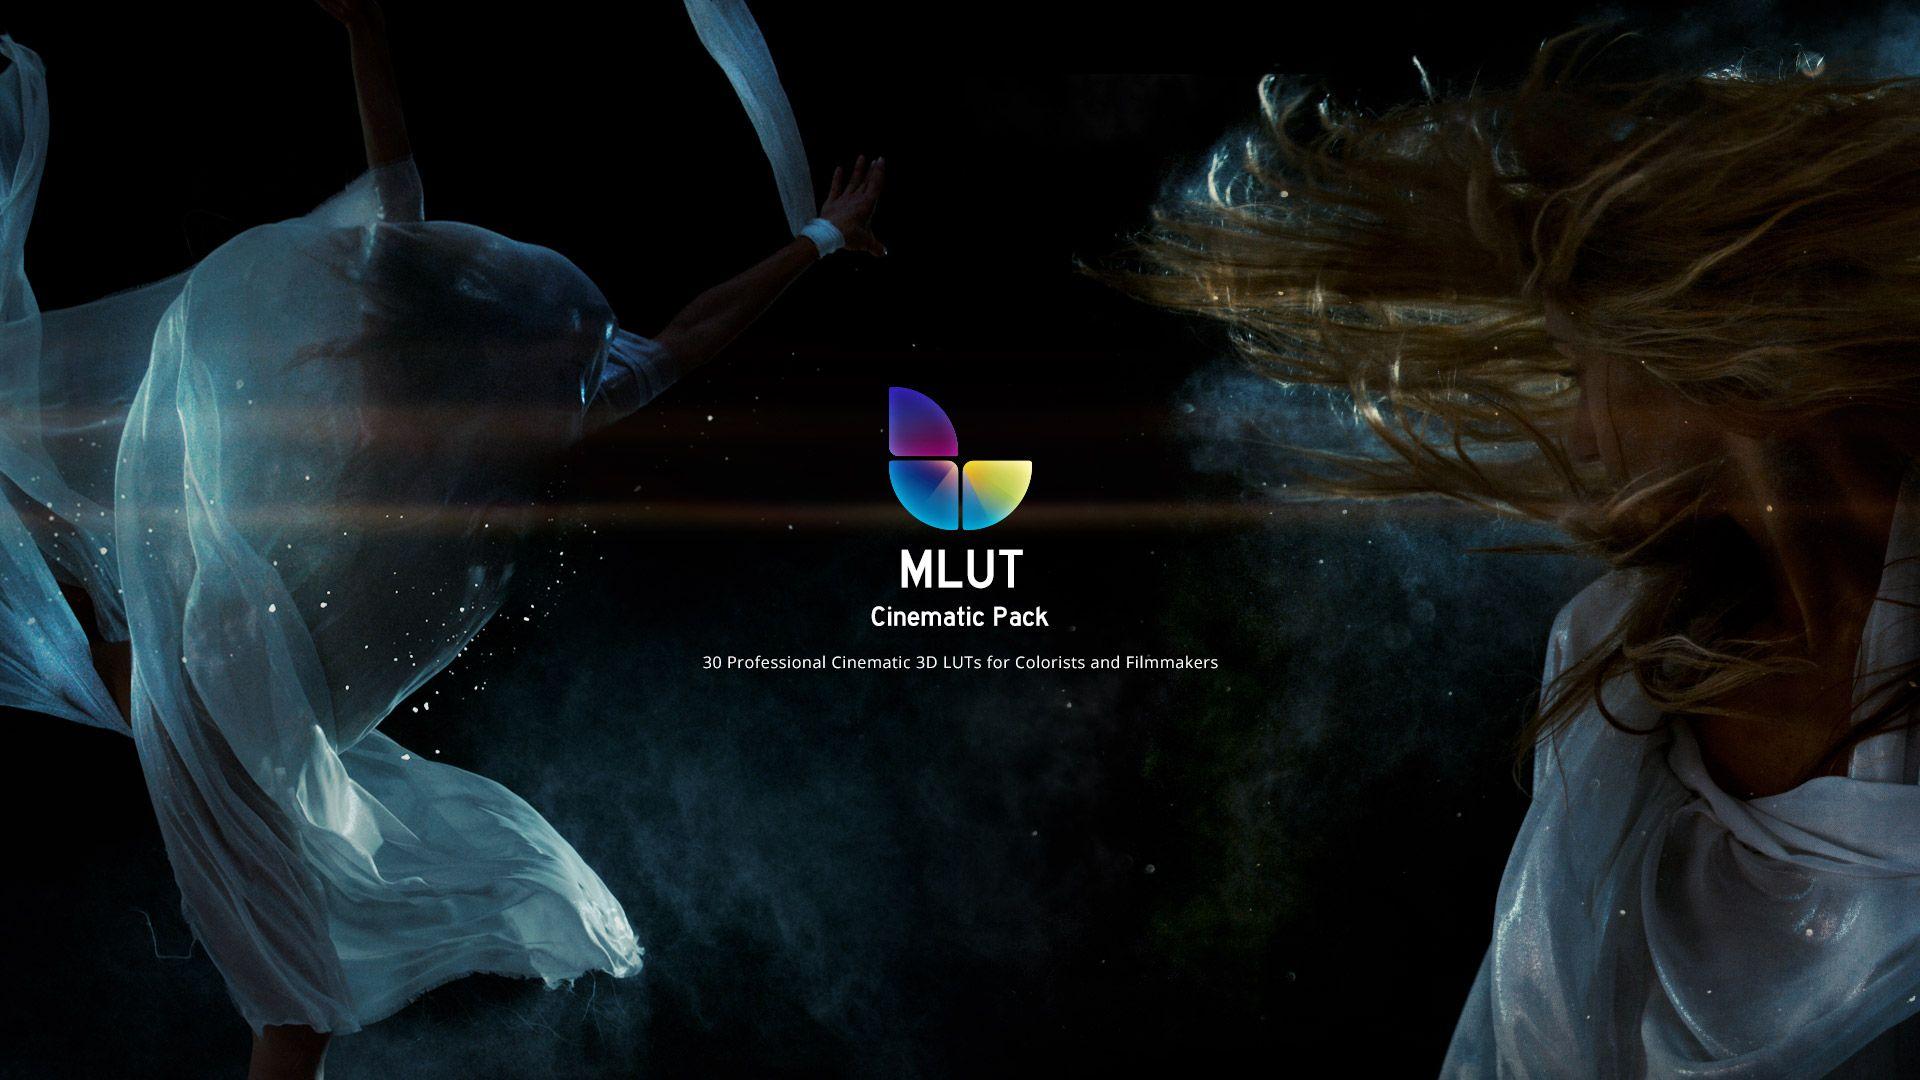 电影级调色预设30组专业LUTS-MotionVFX mLut Cinematic Pack AE预设-第1张